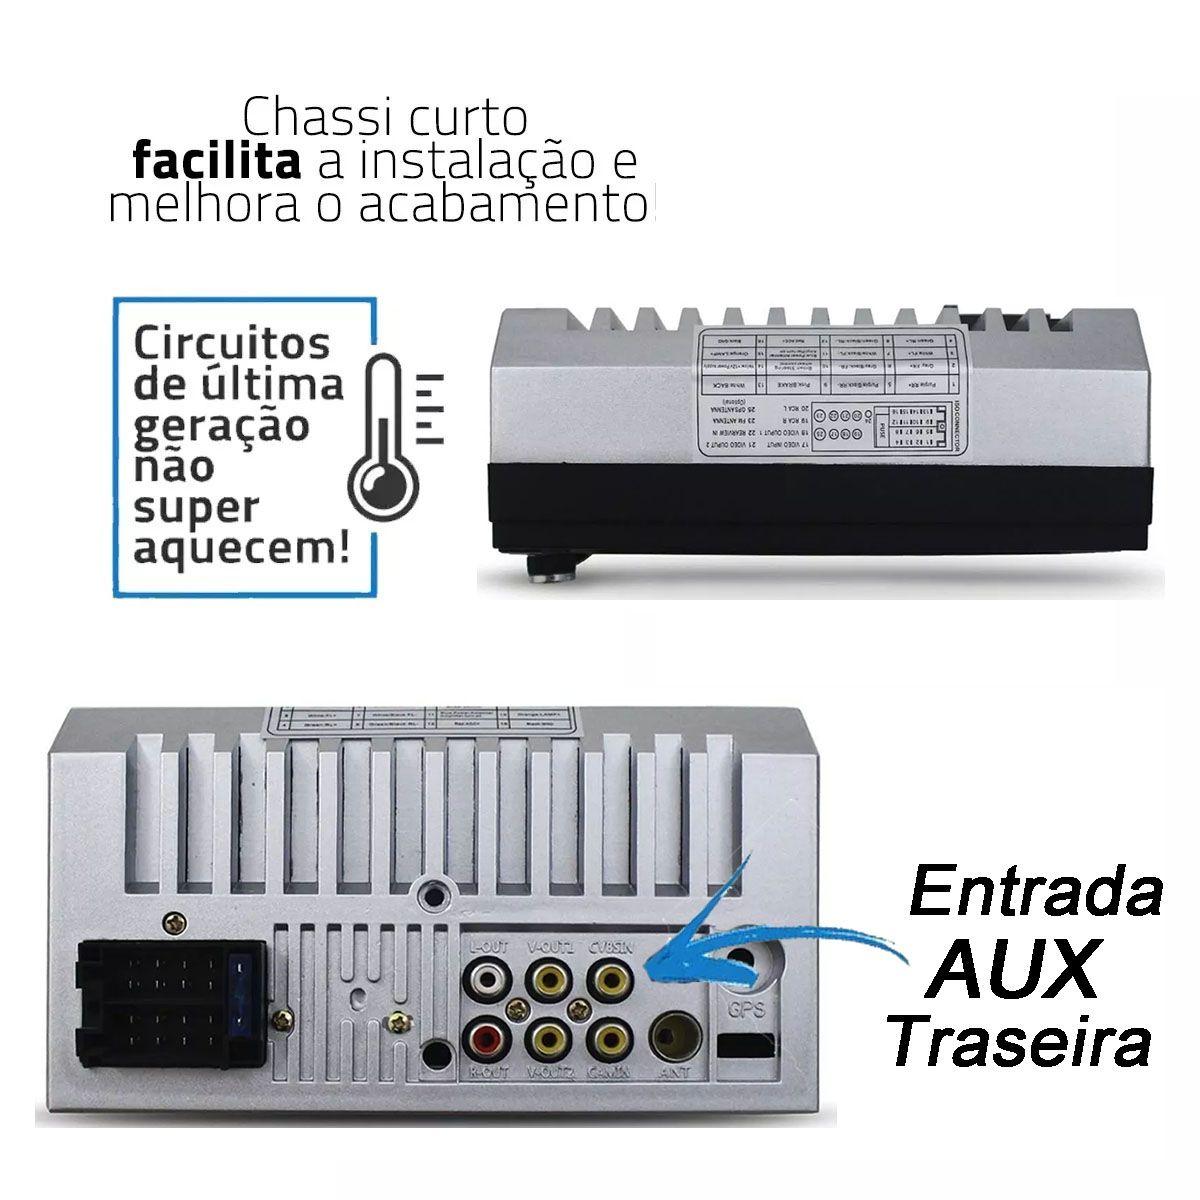 Central Multimídia Automotiva 7 Polegadas + Moldura Grafite 2 Din Vectra 2006 a 2012 Montana 2003 a 2012 Corsa e Meriva 2002 a 2013 Chevrolet Gm